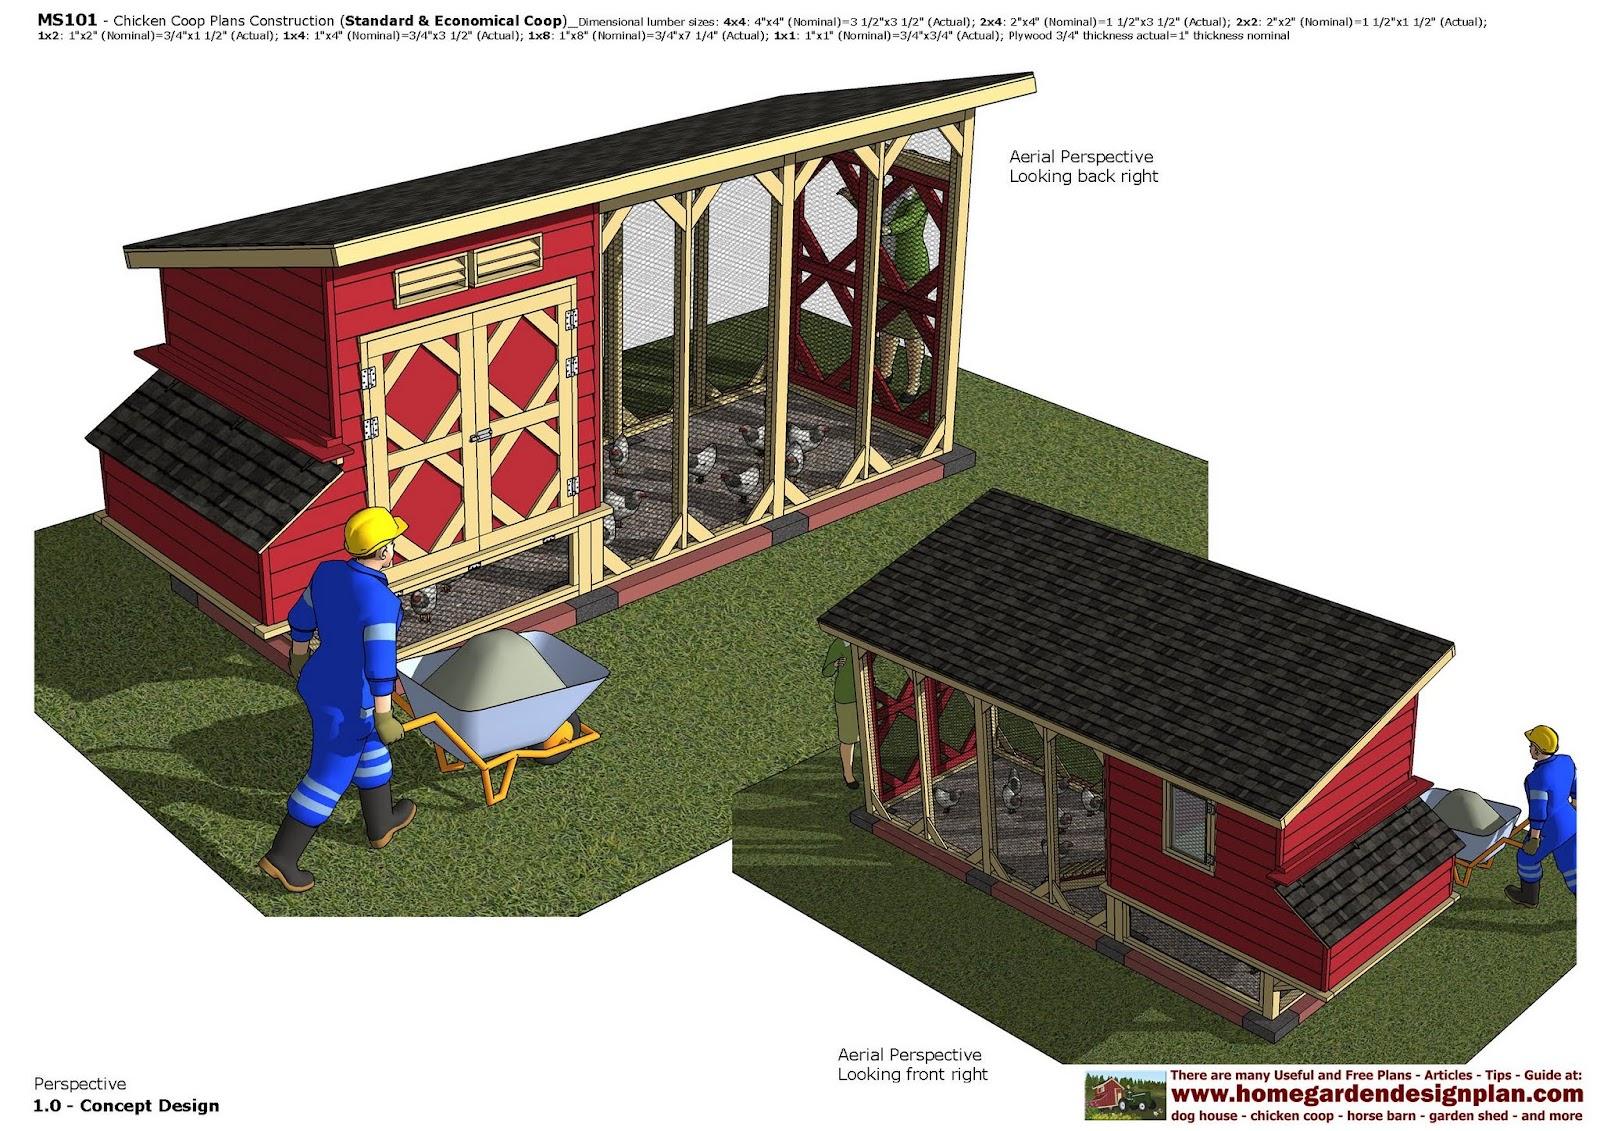 Home garden plans ms101 chicken coop plans construction for Chicken coop for 2 chickens